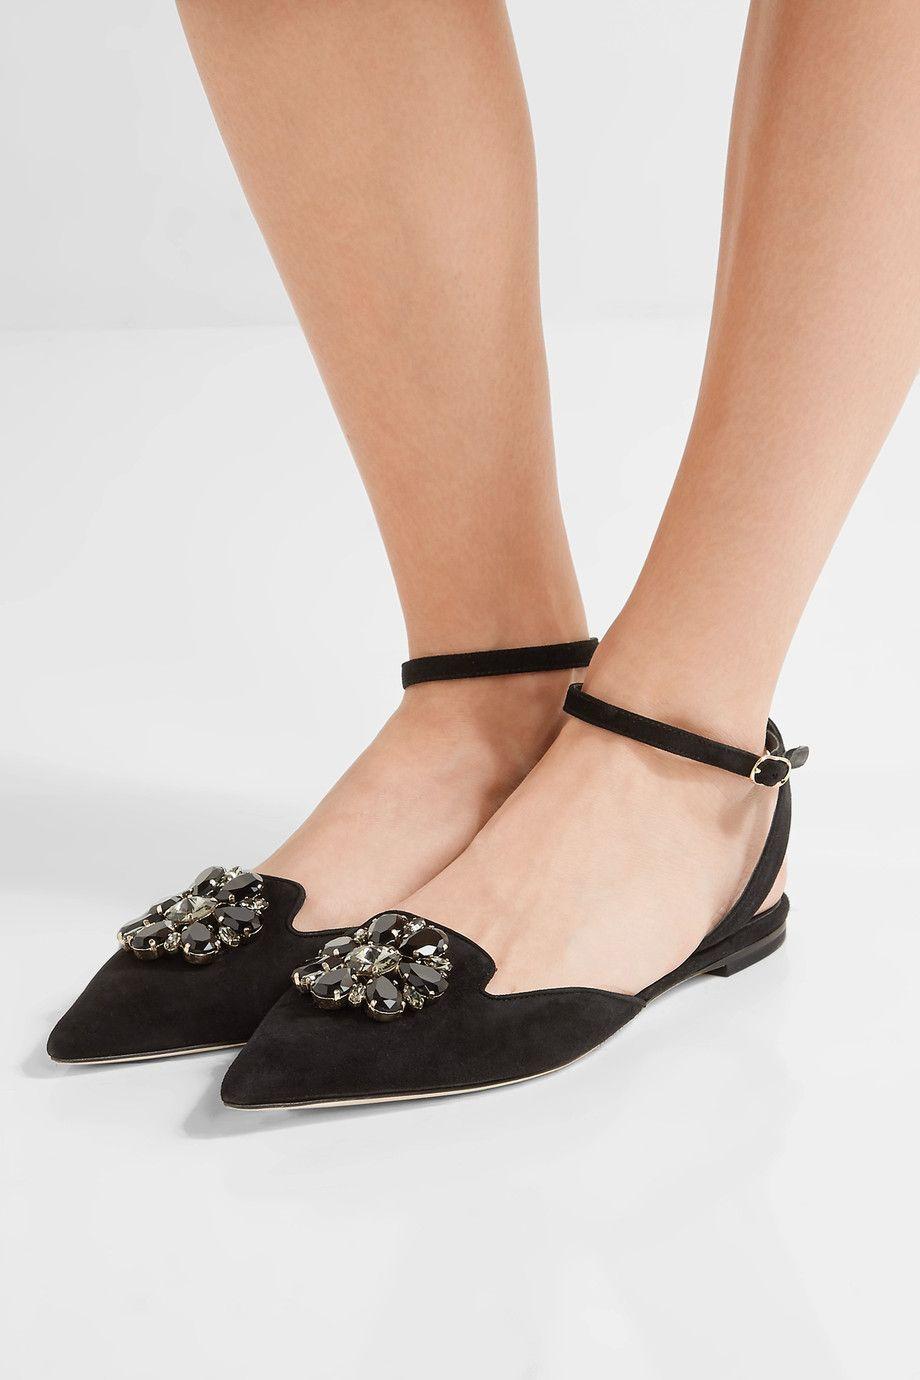 Bellucci embellished suede sandals Dolce & Gabbana qlVGoF